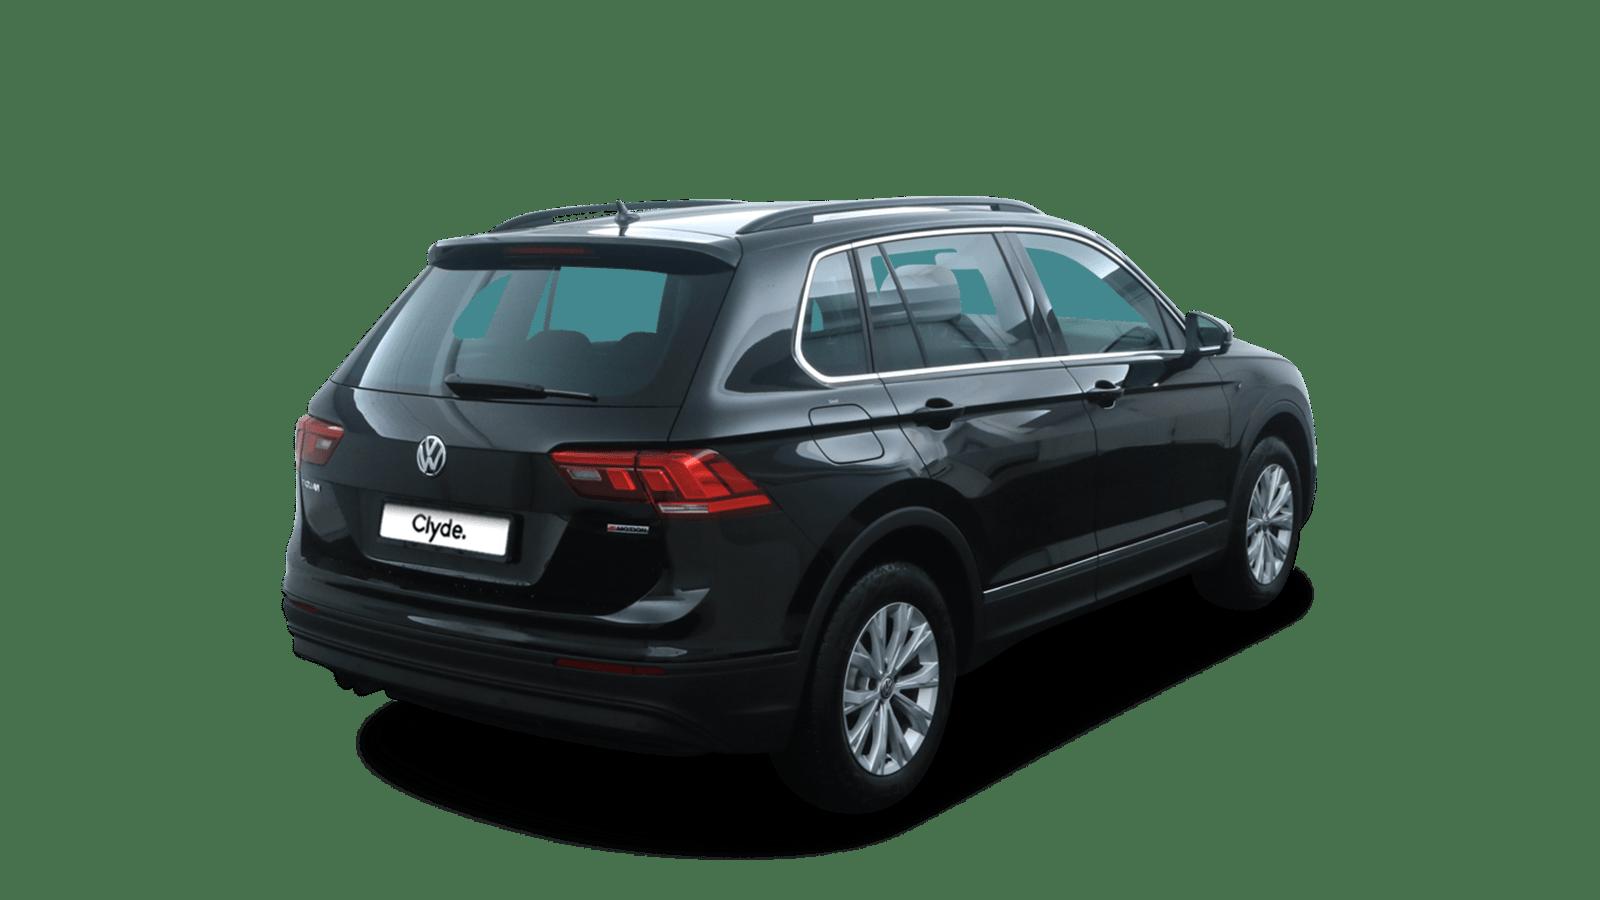 VW Tiguan Black back - Clyde car subscription